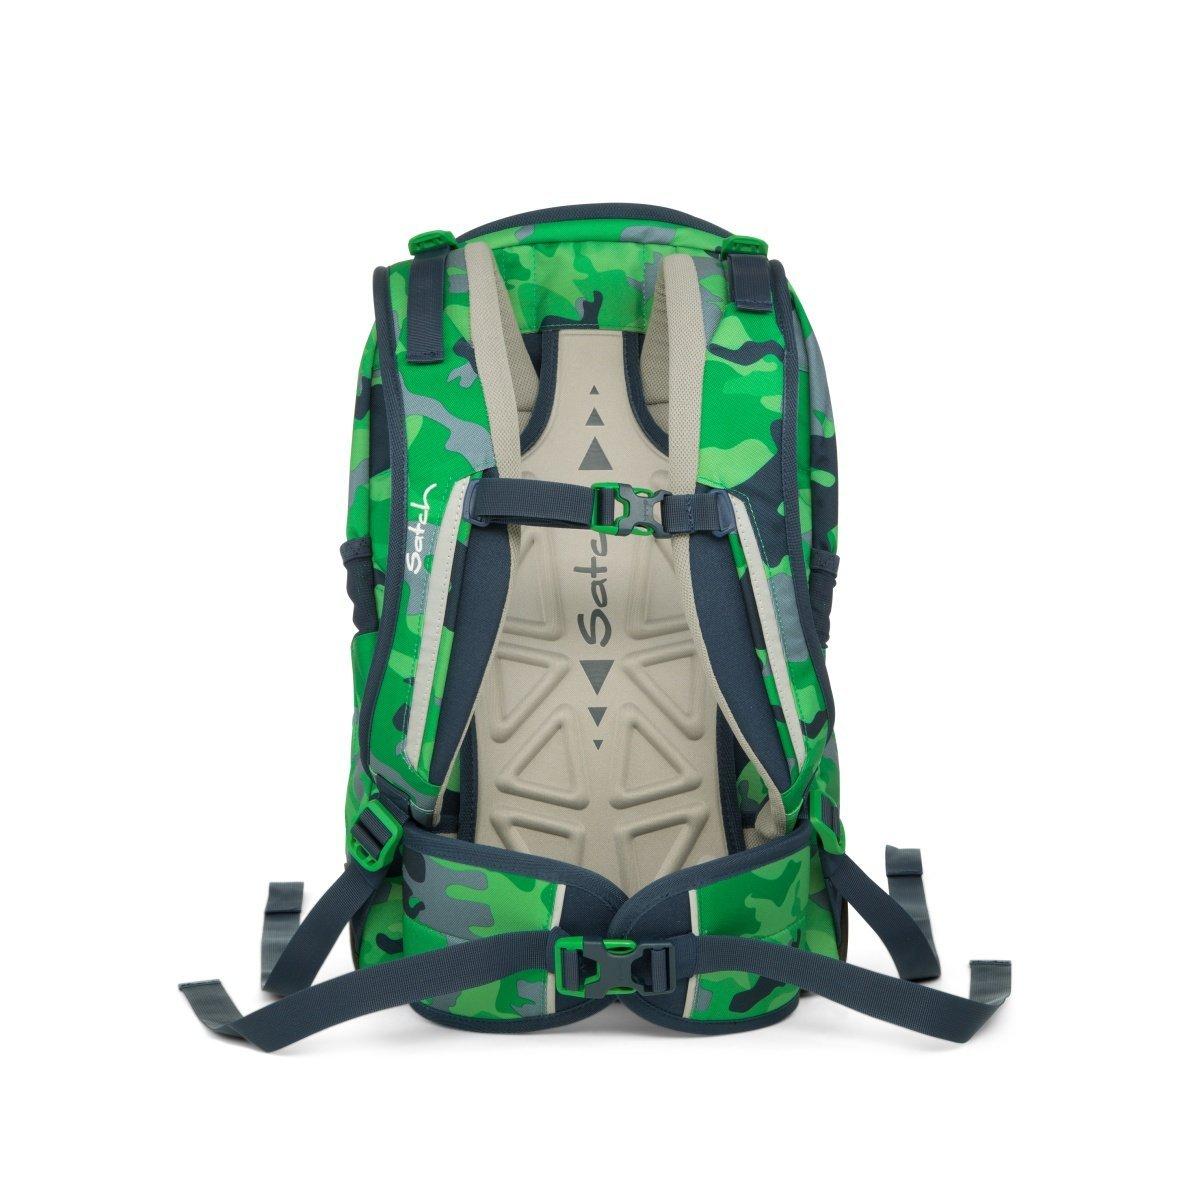 Рюкзак Ergobag Satch Sleek цвет Green Camou, - фото 5